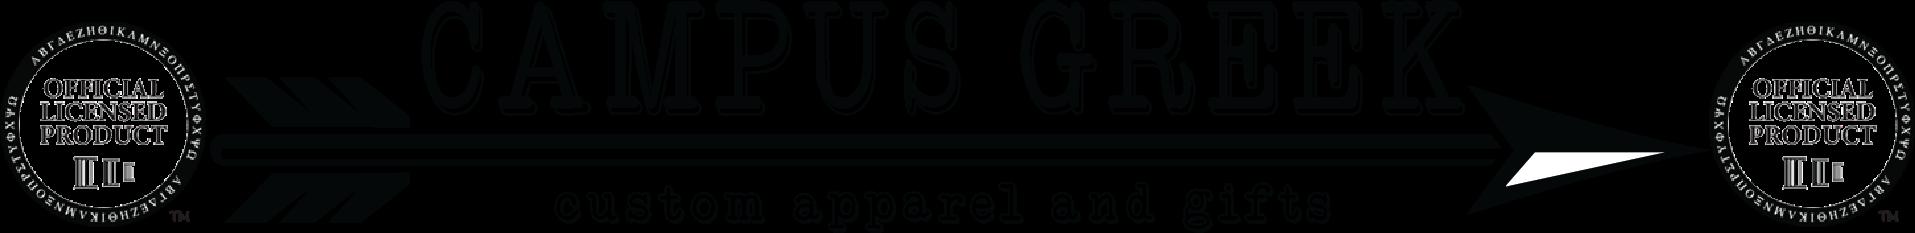 https://campusgreekshop.myshopify.com/collections/kappa-delta-chi